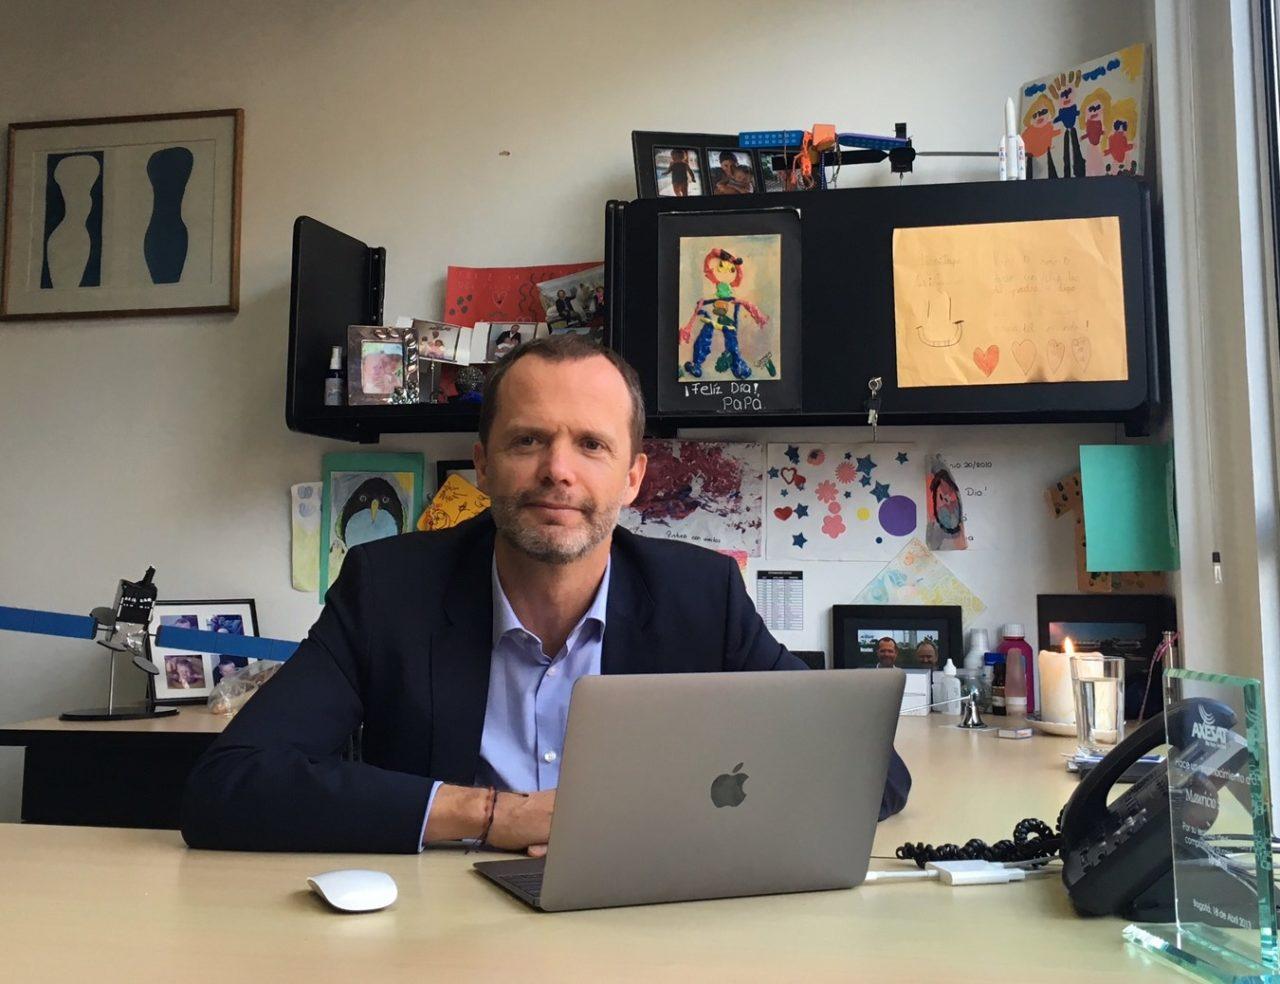 Mauricio Segovia is the CEO of Axesat.